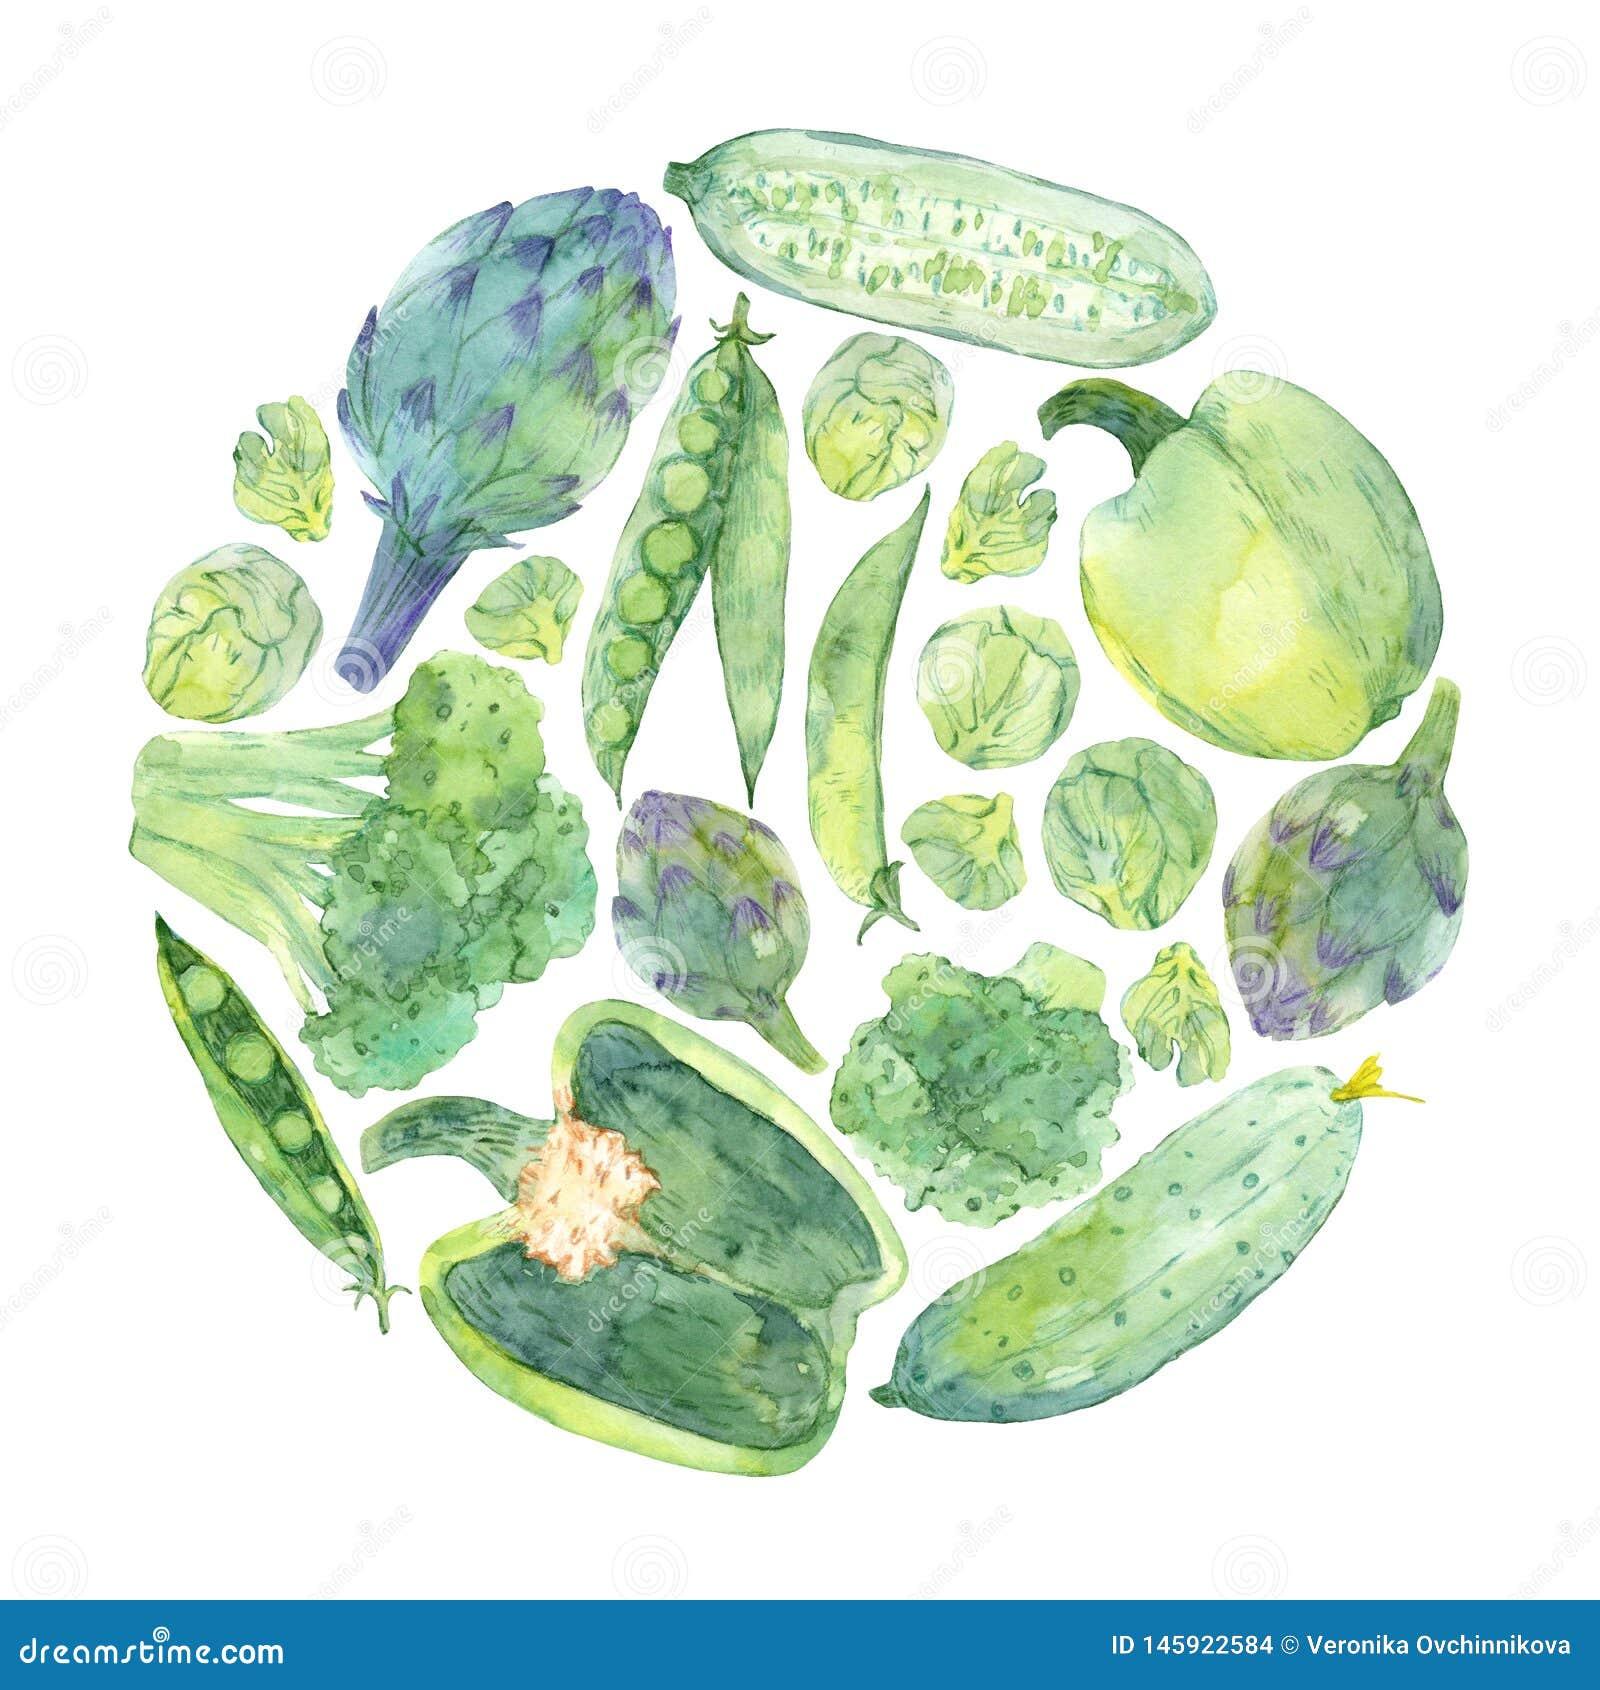 Watercolor sketching of fresh green vegetables in circle